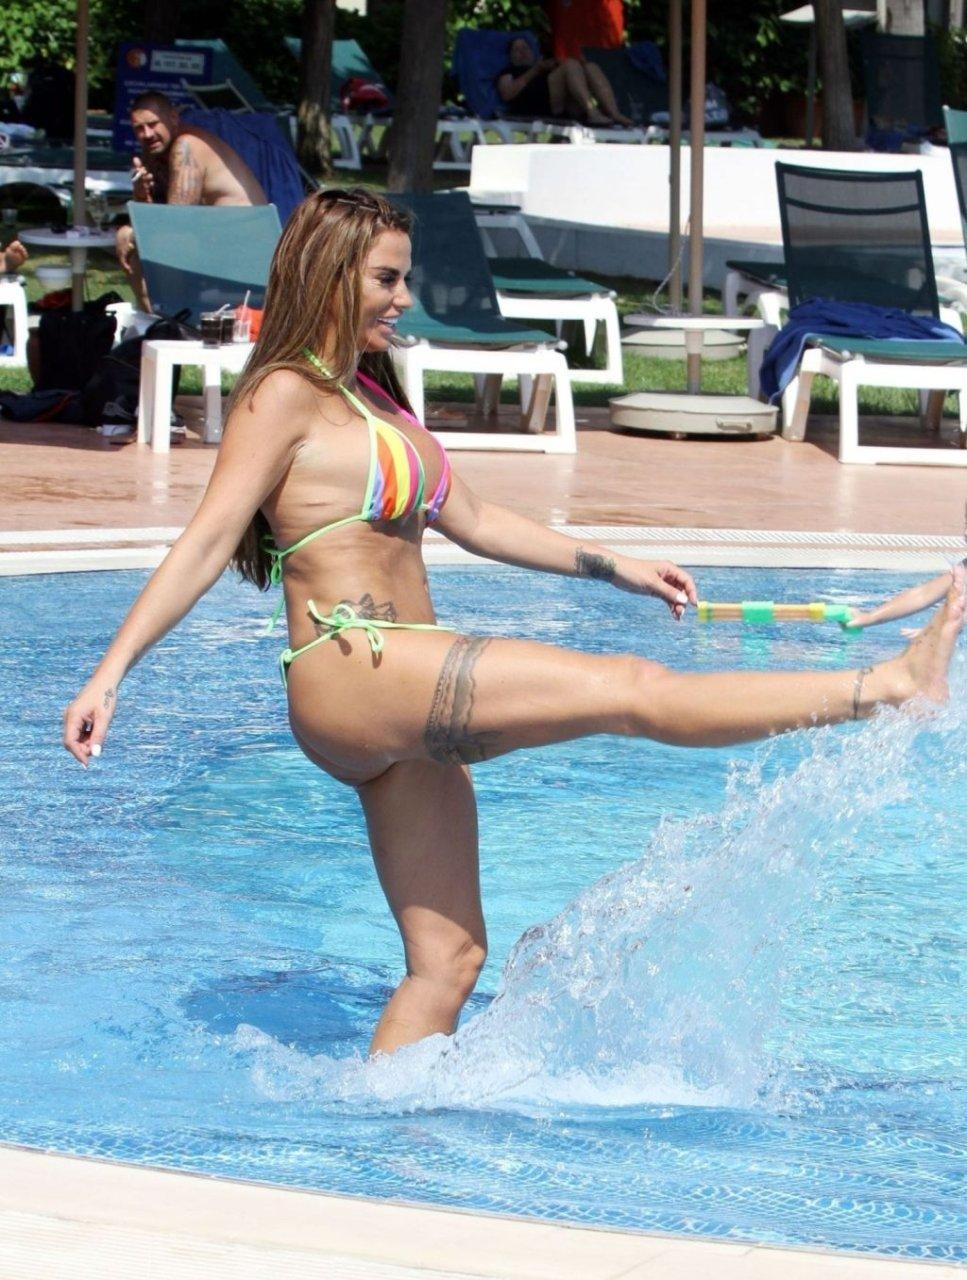 Katie-Price-Nude-Sexy-TheFappeningBlog.com-15-1024x1356.jpg